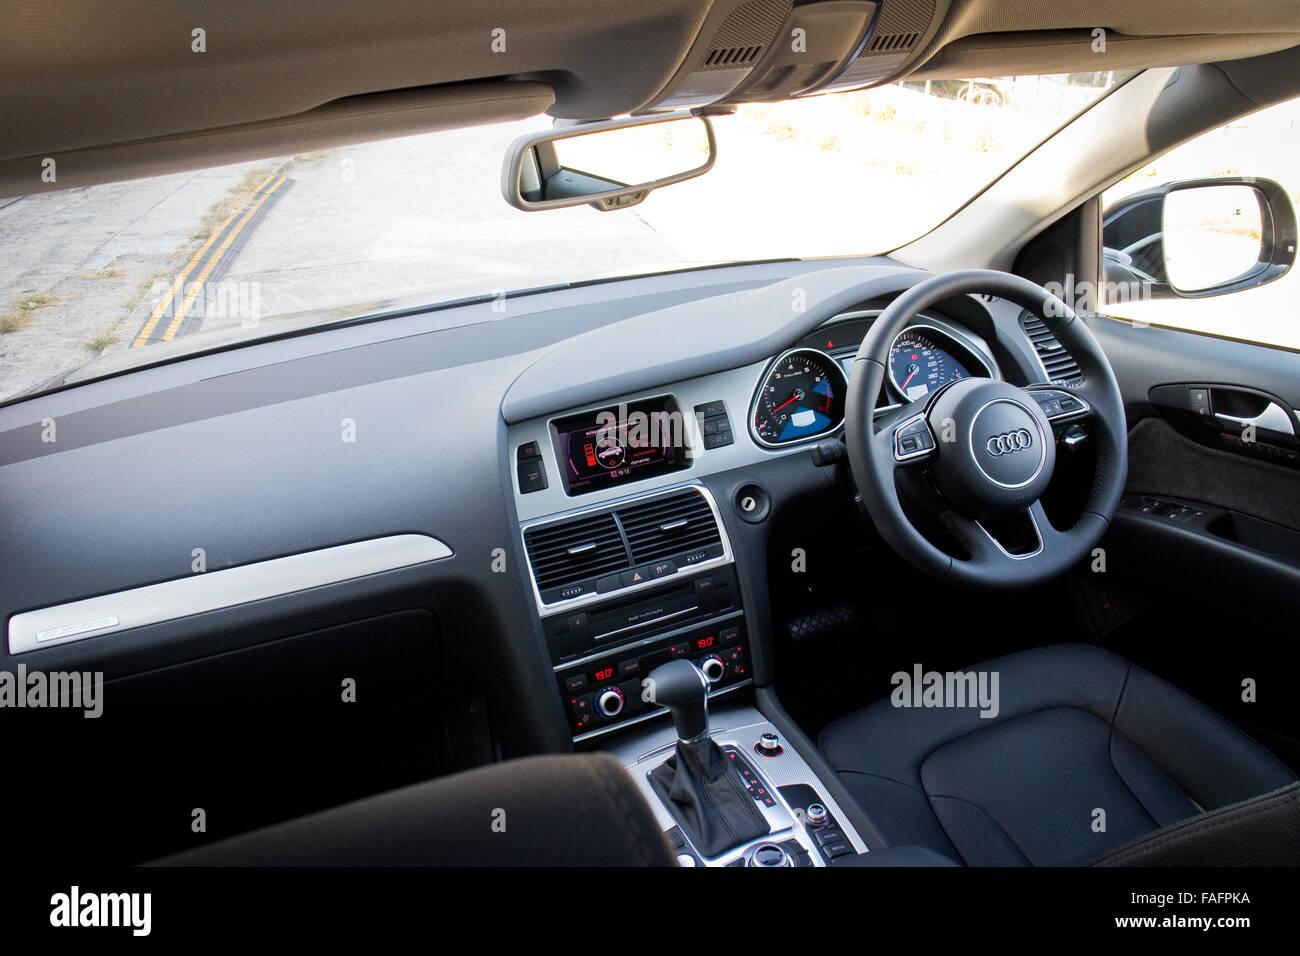 Audi Q7 Interior Fotos E Imagenes De Stock Alamy